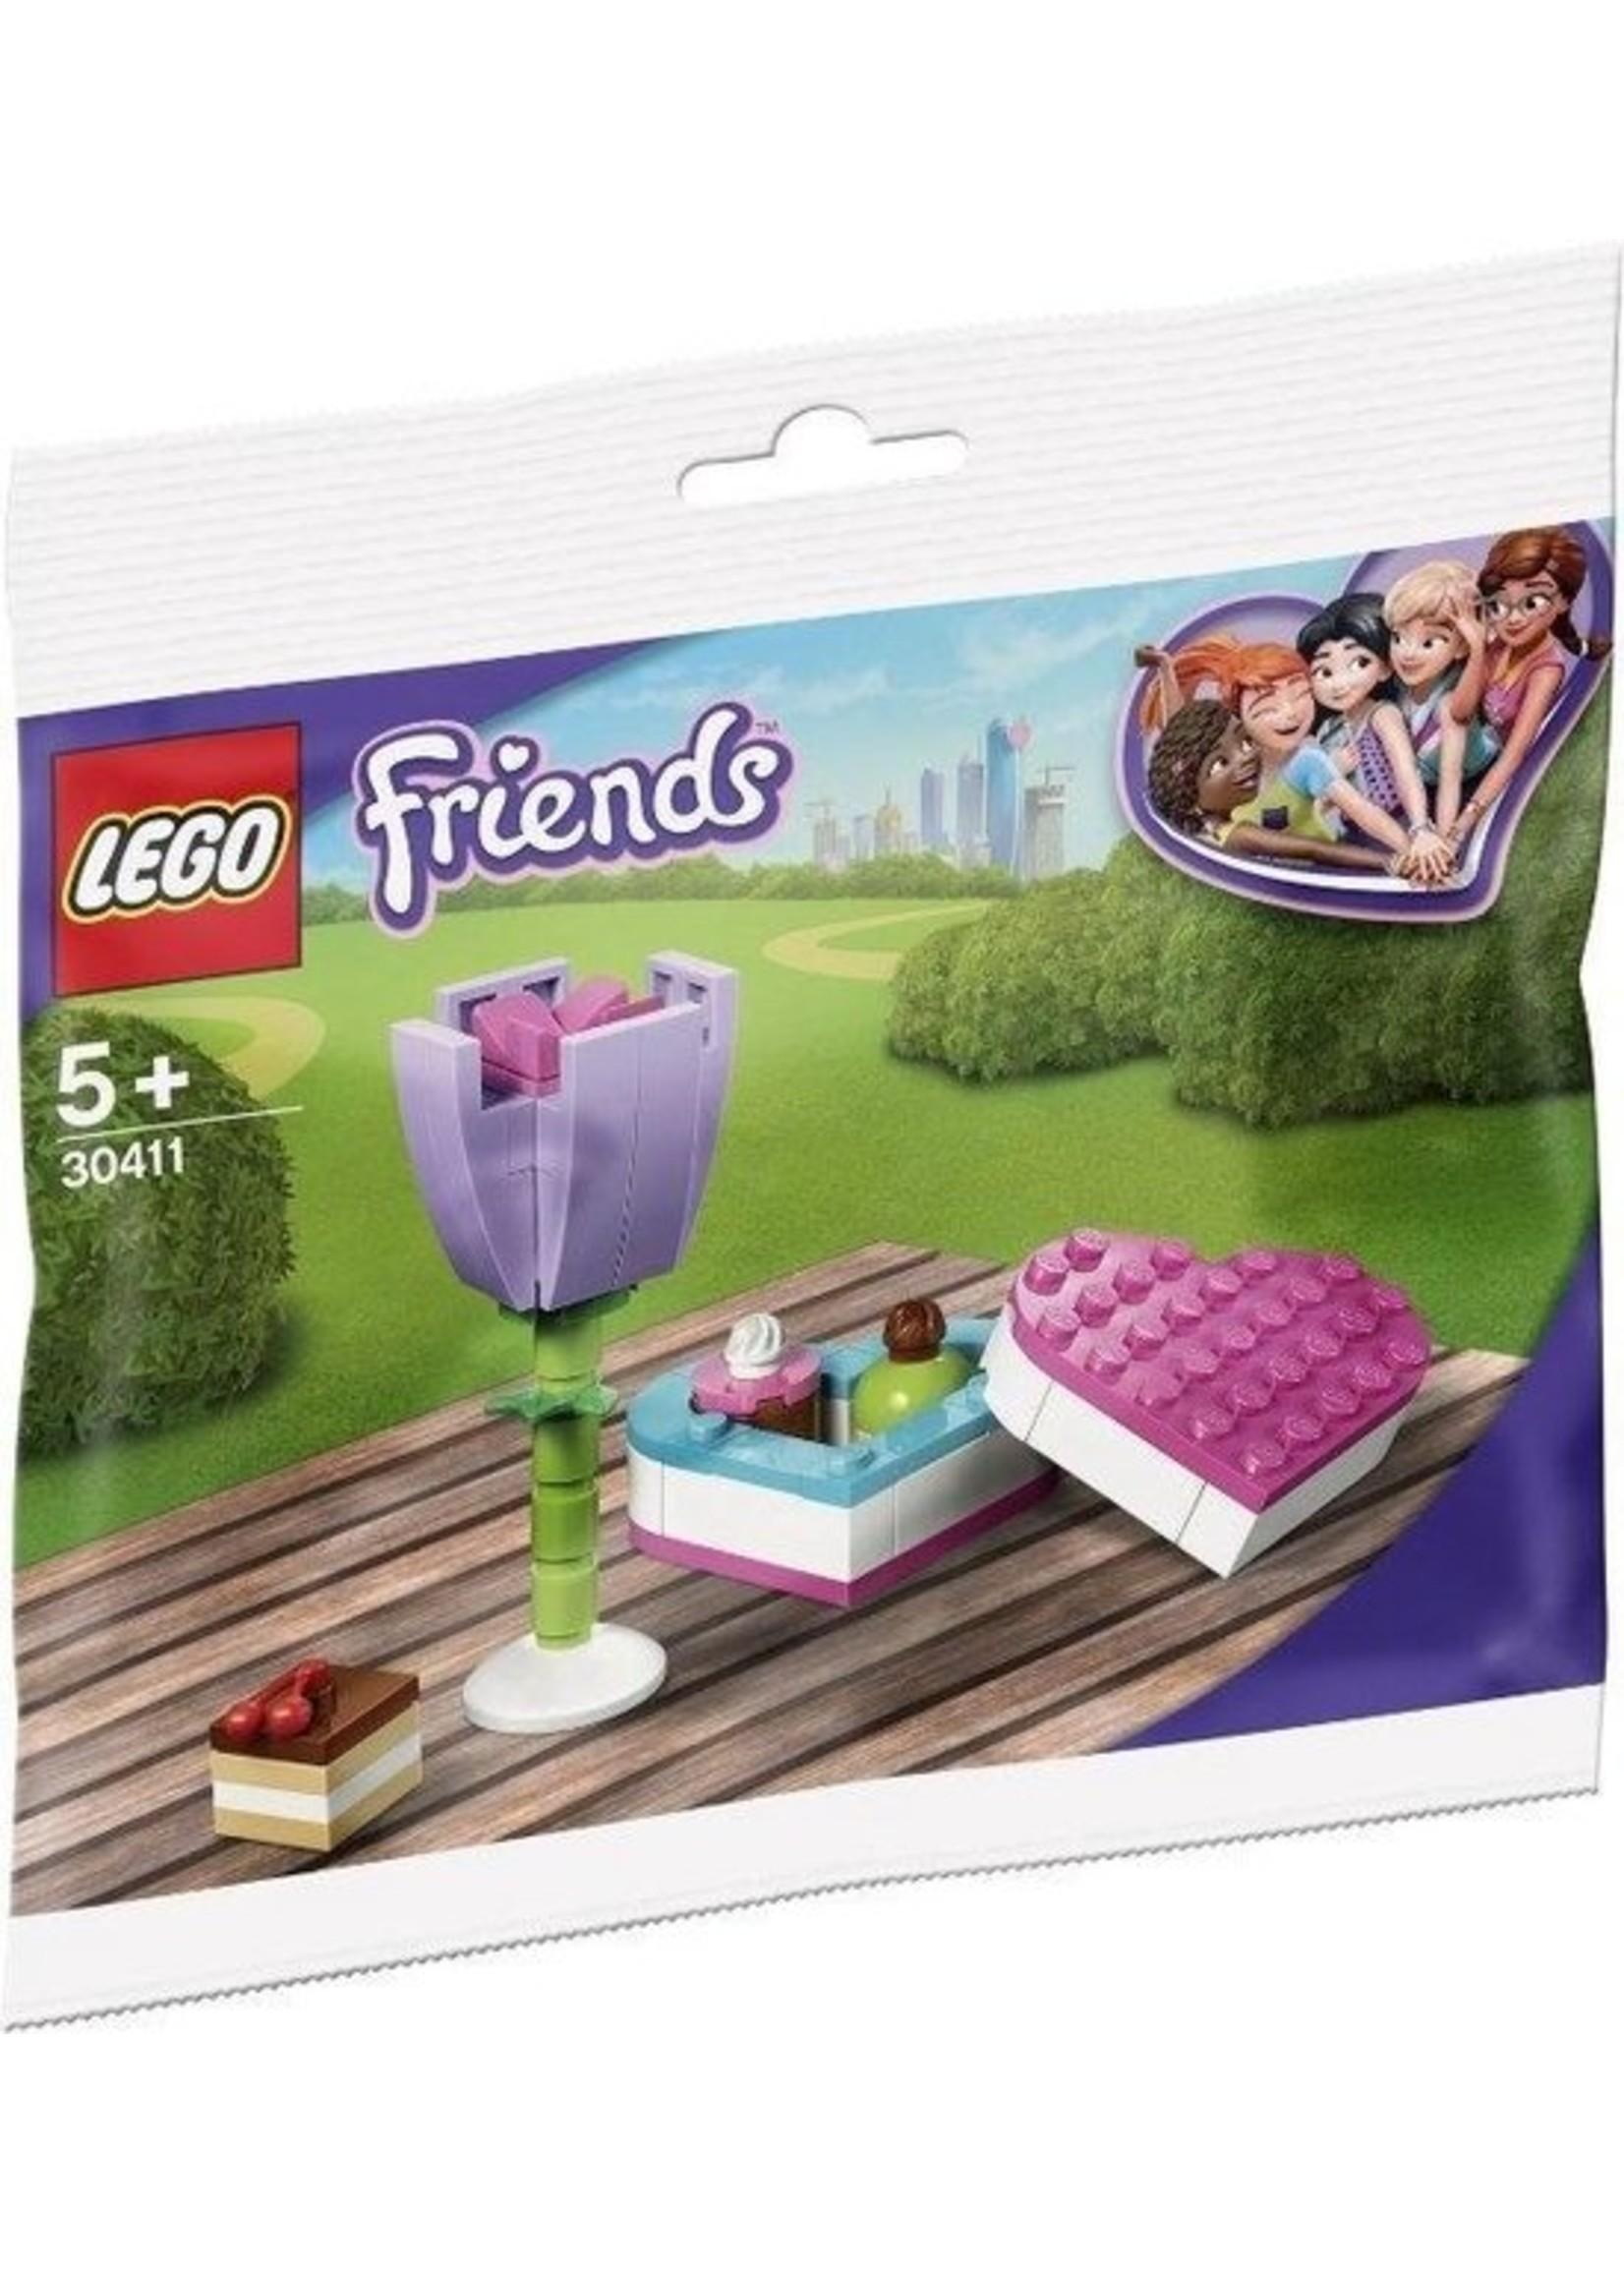 LEGO Friends Snoepdoos en Bloem (Polybag) 30411